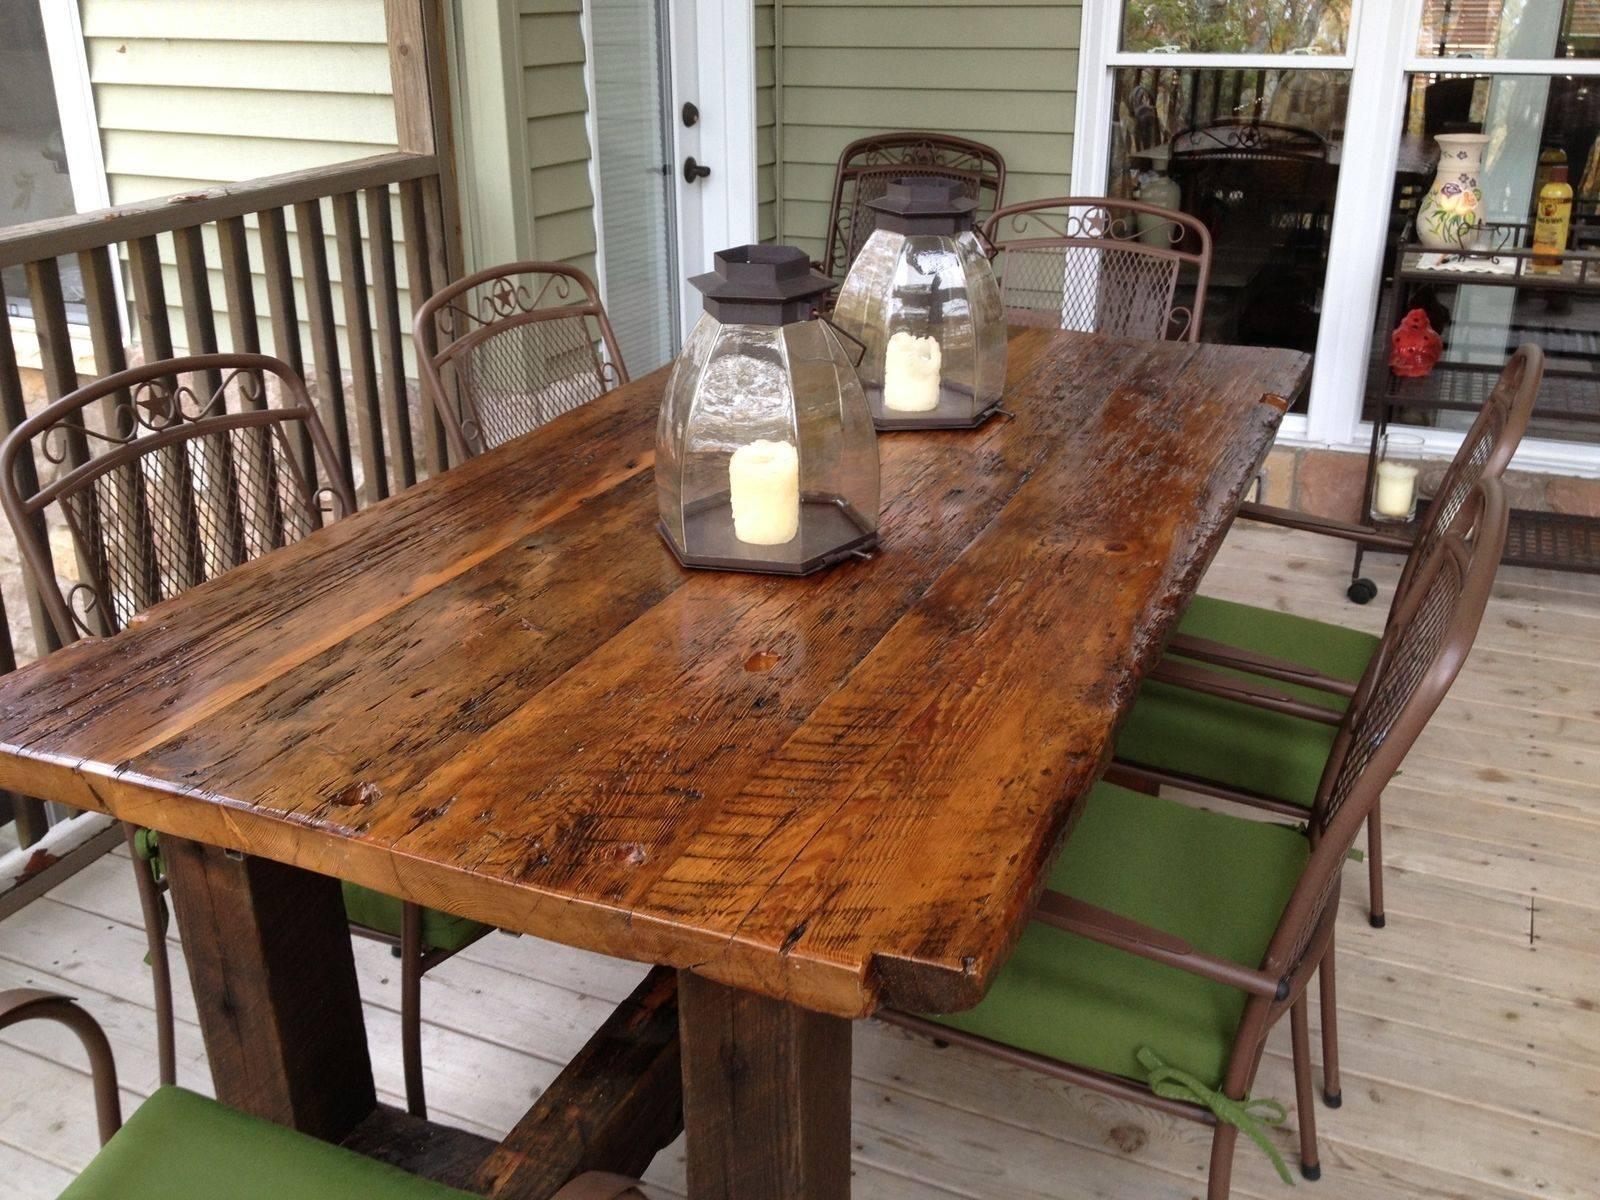 Reclaimed Wood Furniture And Barnwood Furniture | Custommade inside Rustic Barnwood Coffee Tables (Image 23 of 30)